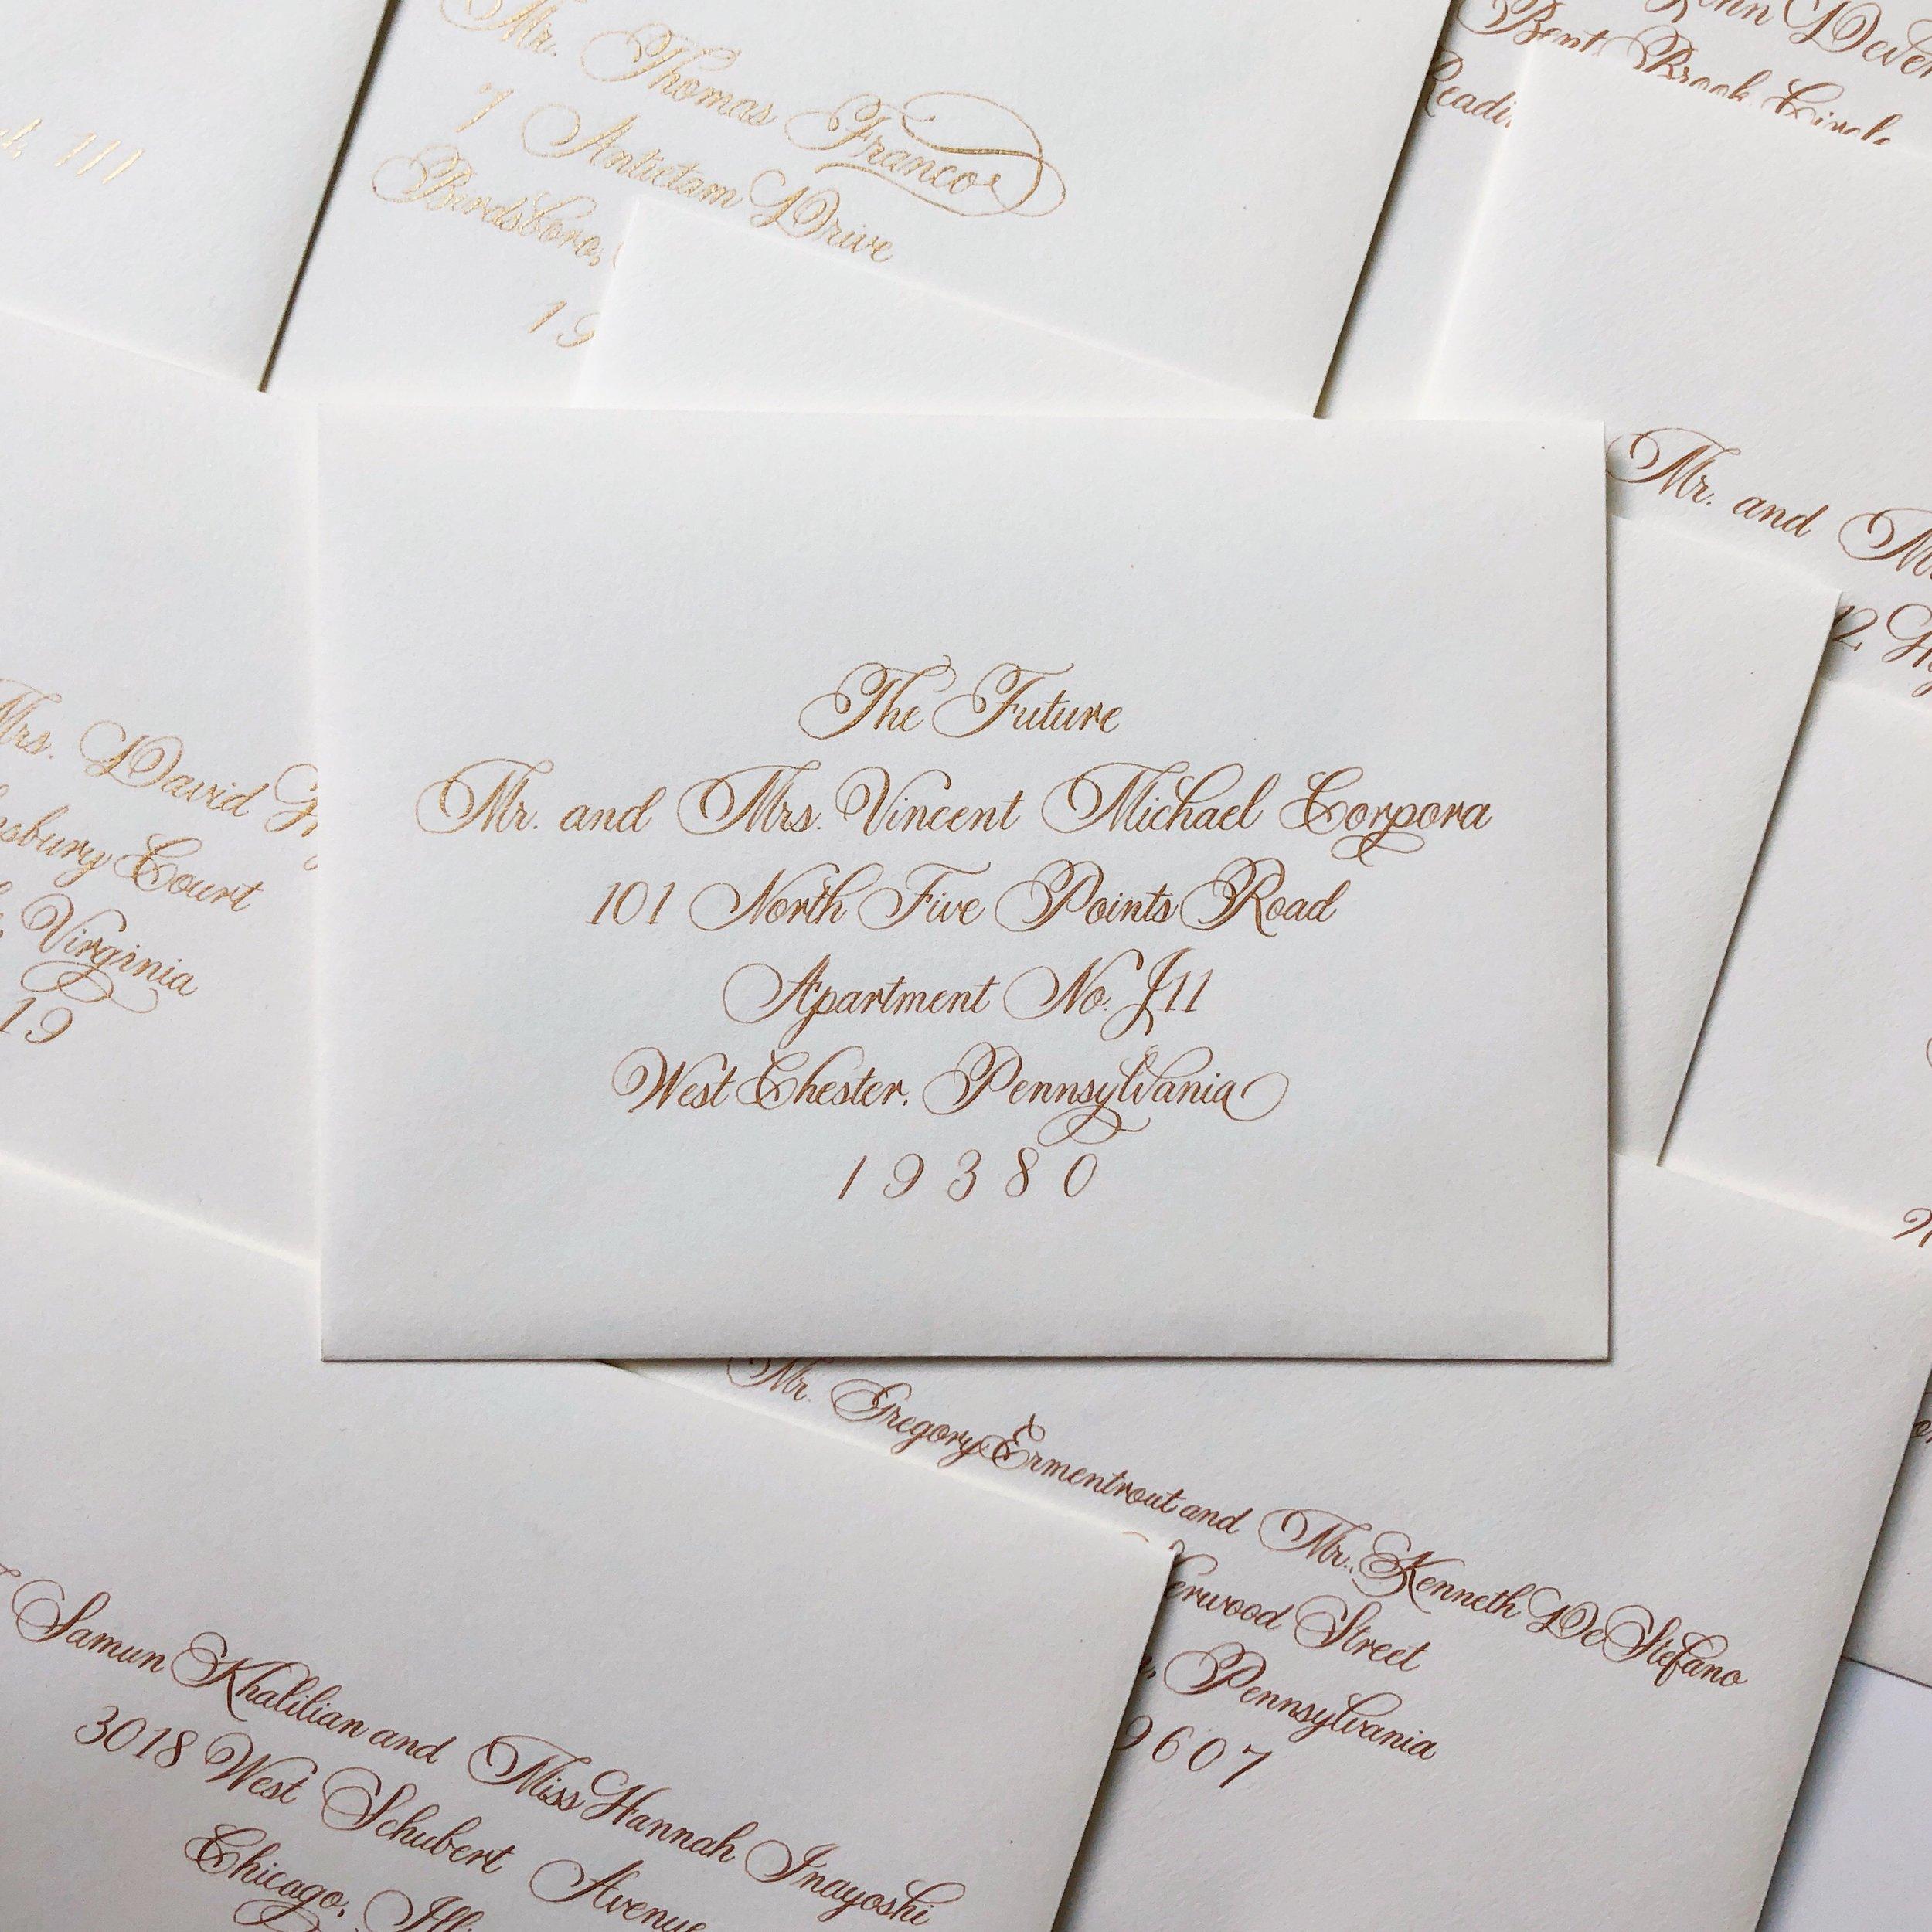 Central PA, York PA, JesSmith Designs, custom, wedding, invitations, bridal, Harrisburg, hanover, calligraphy, baltimore, wedding invitations, lancaster, gettysburg, 06-25 15.49.20.jpg